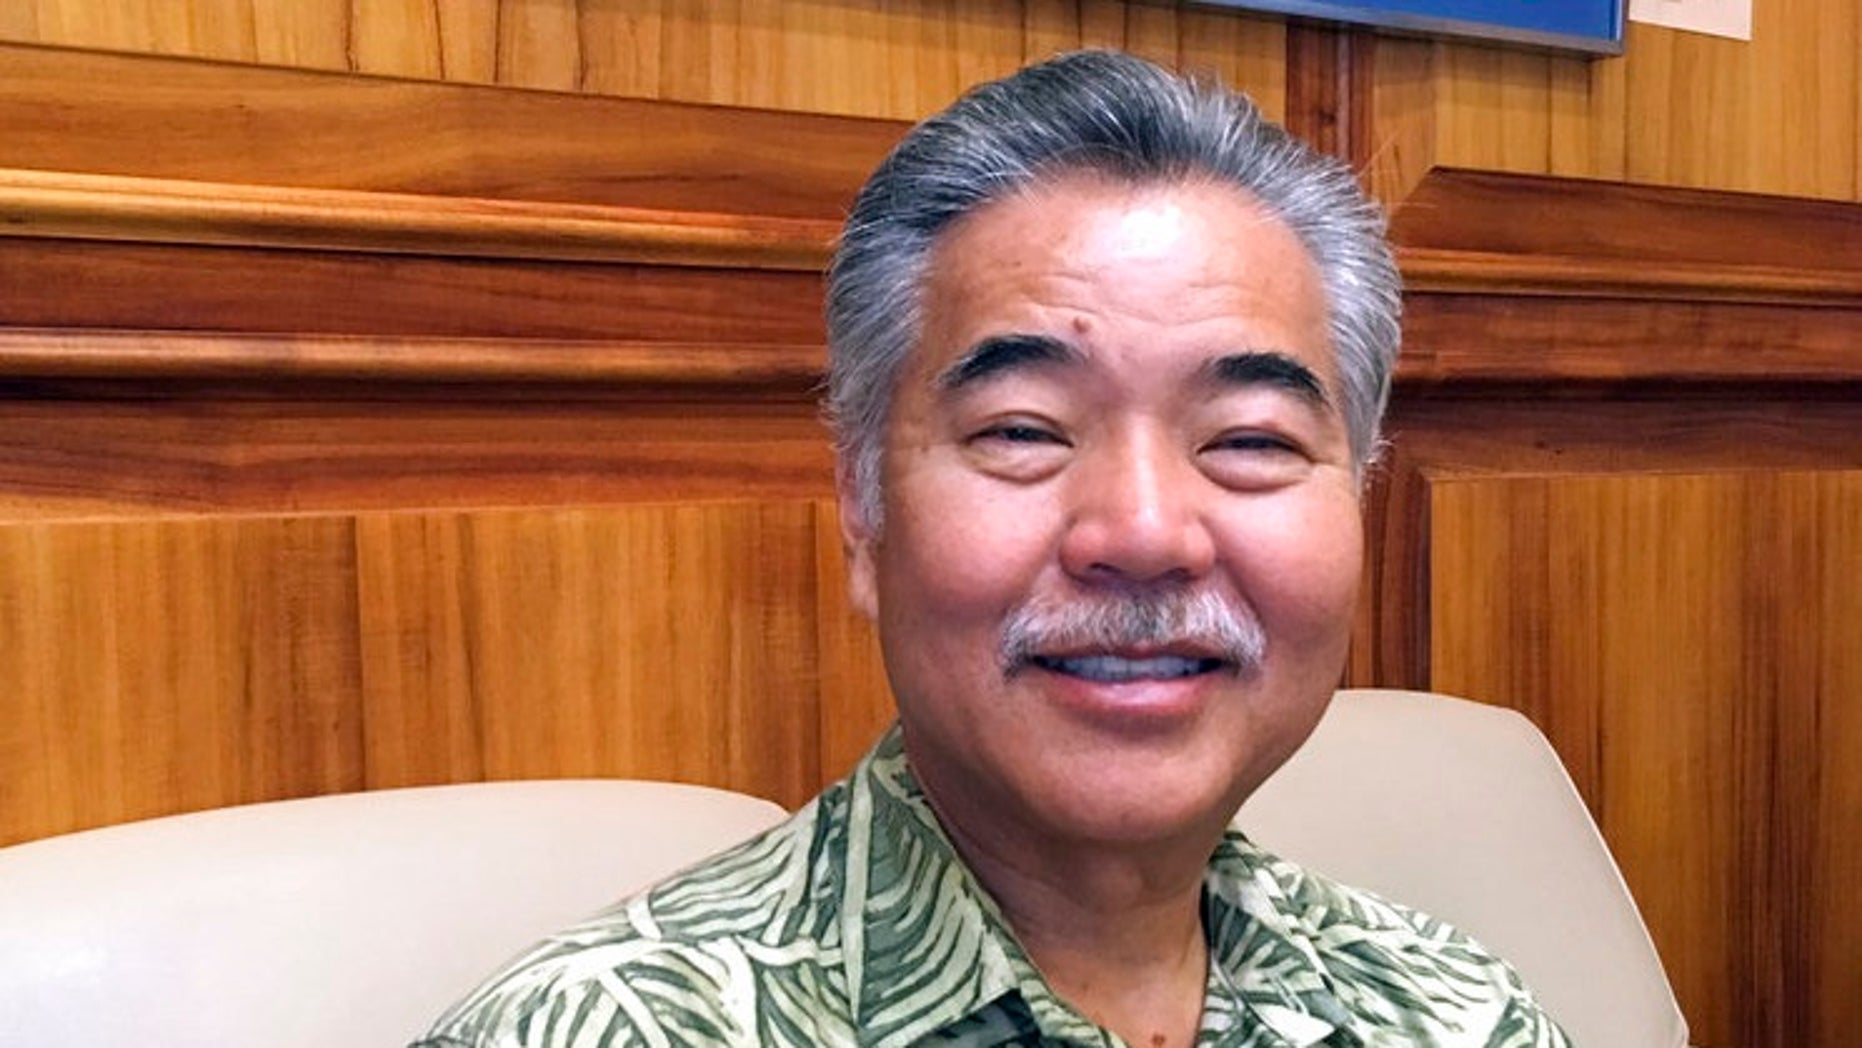 Hawaii Gov. David Ige is seen in Honolulu, Jan. 9, 2018.